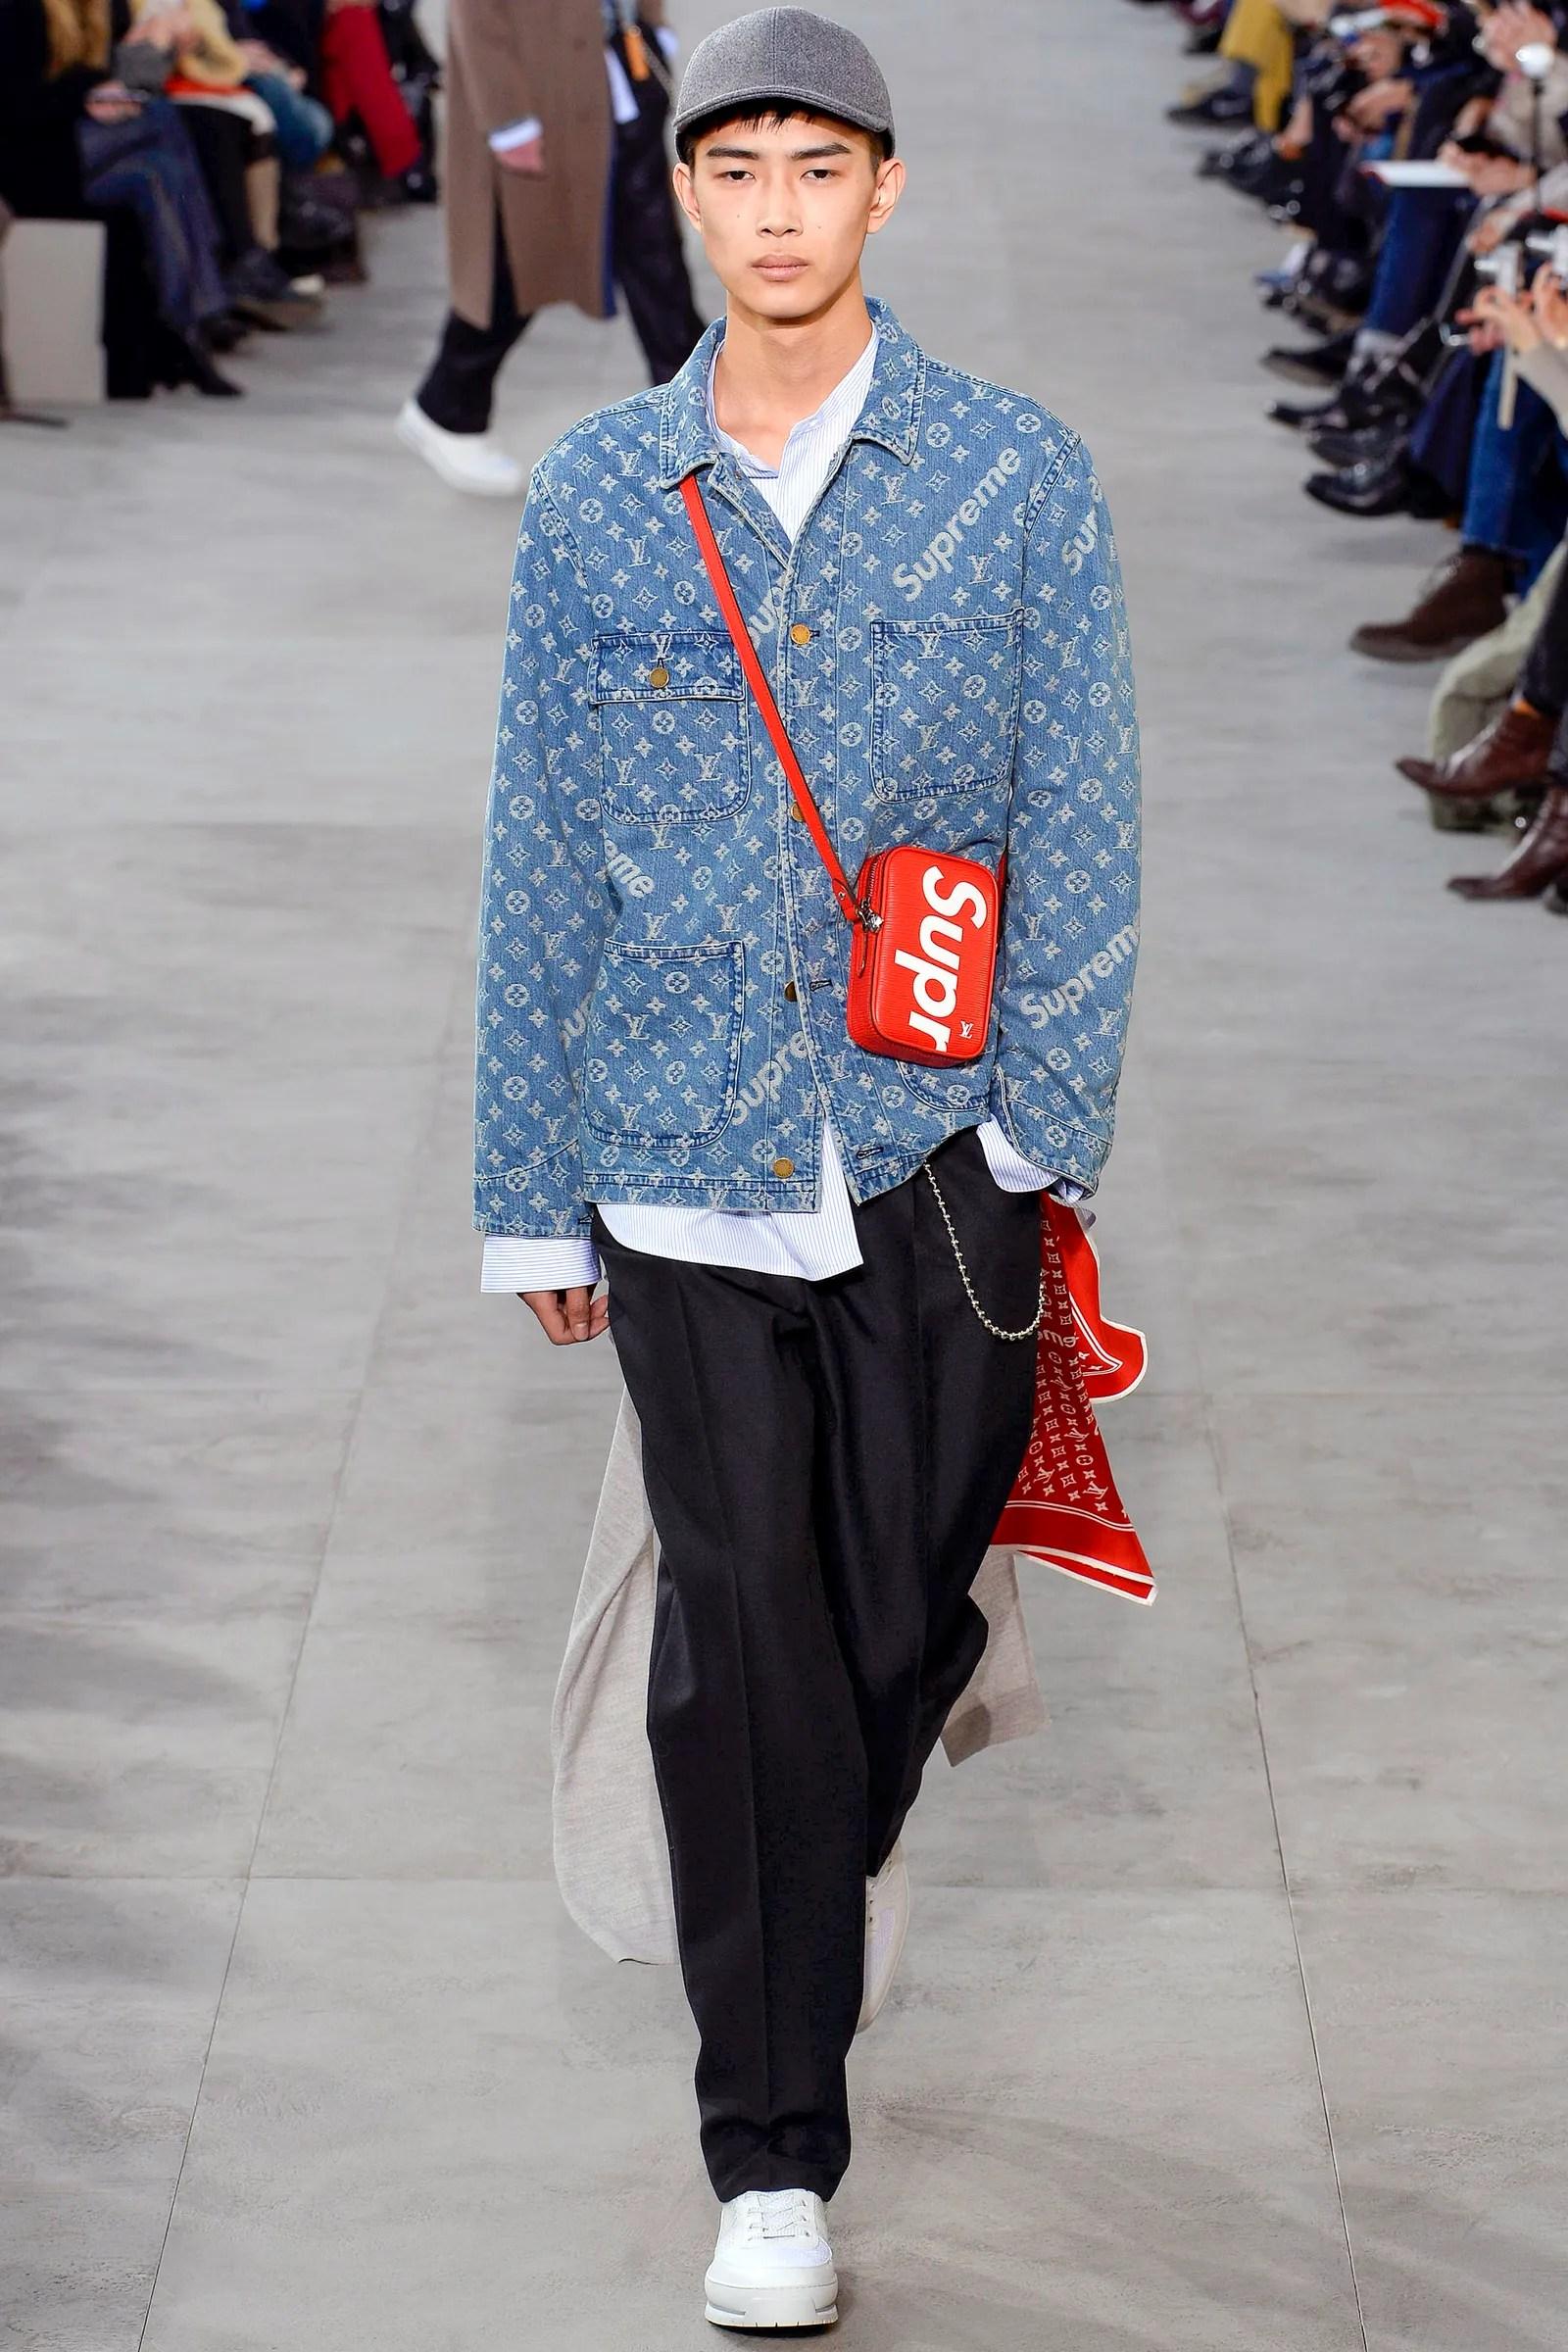 A model walking down a runway dressed in a denim coat and black pants